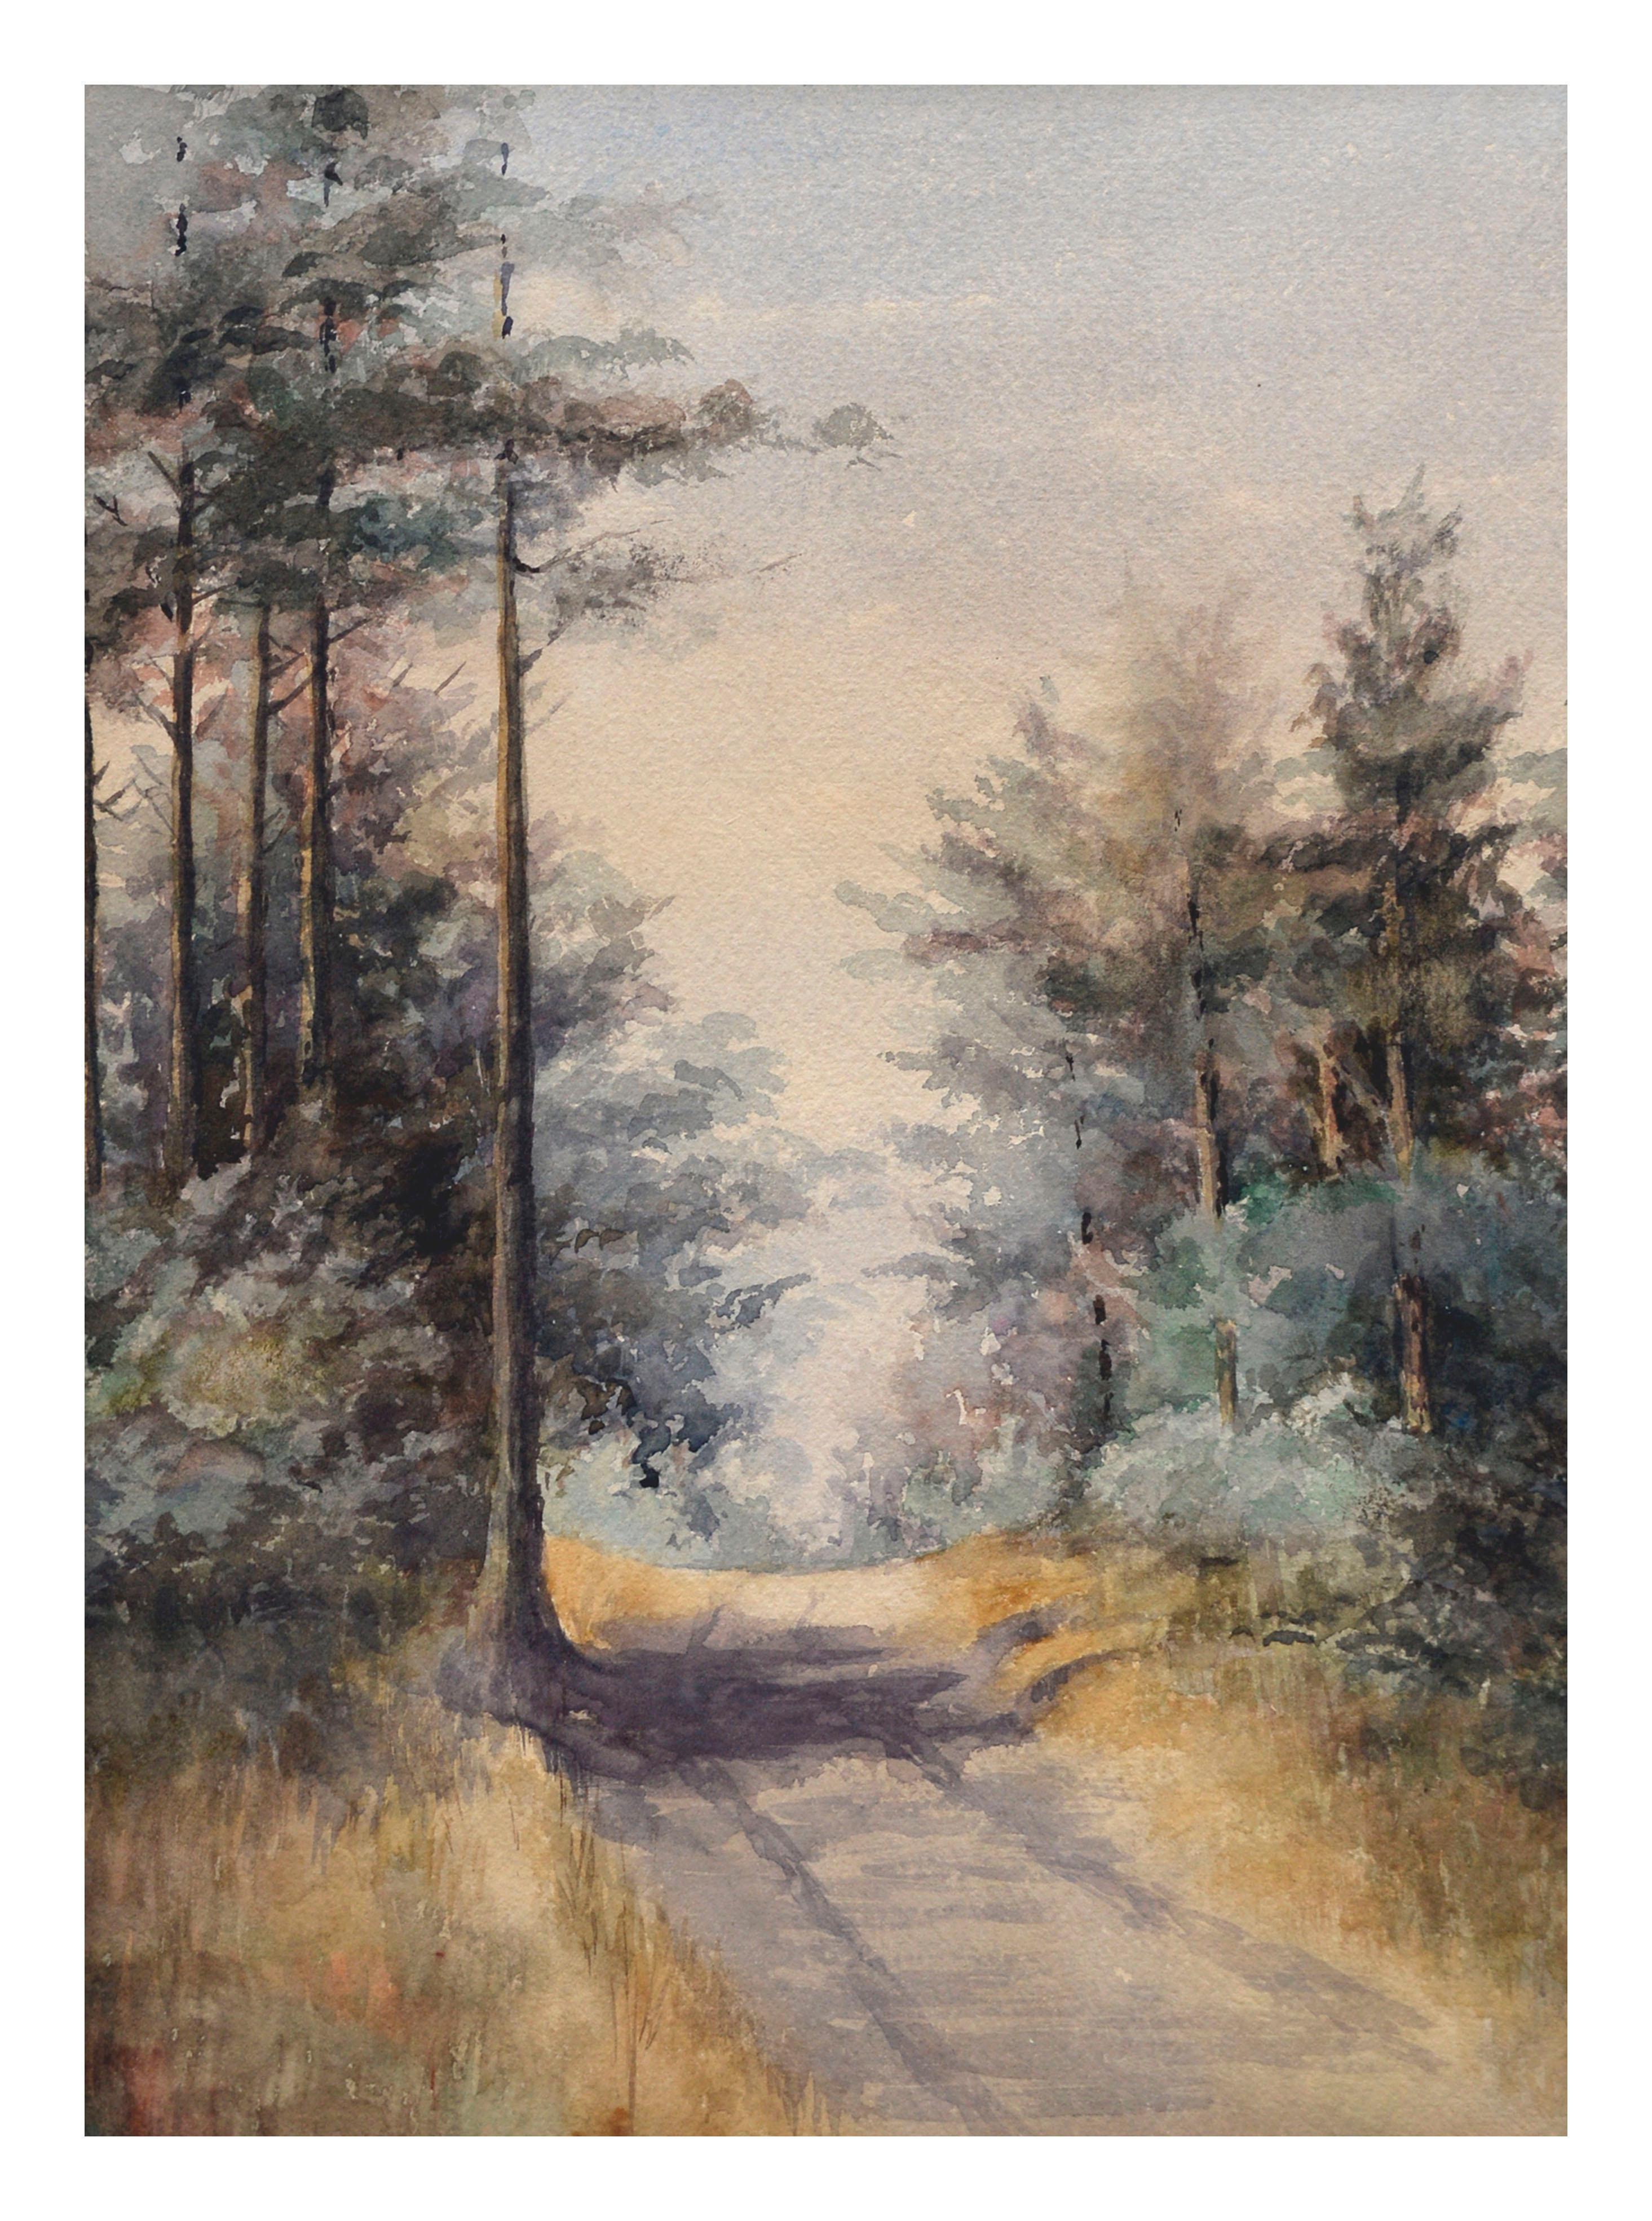 Late 19th Century Bay Area Landscape